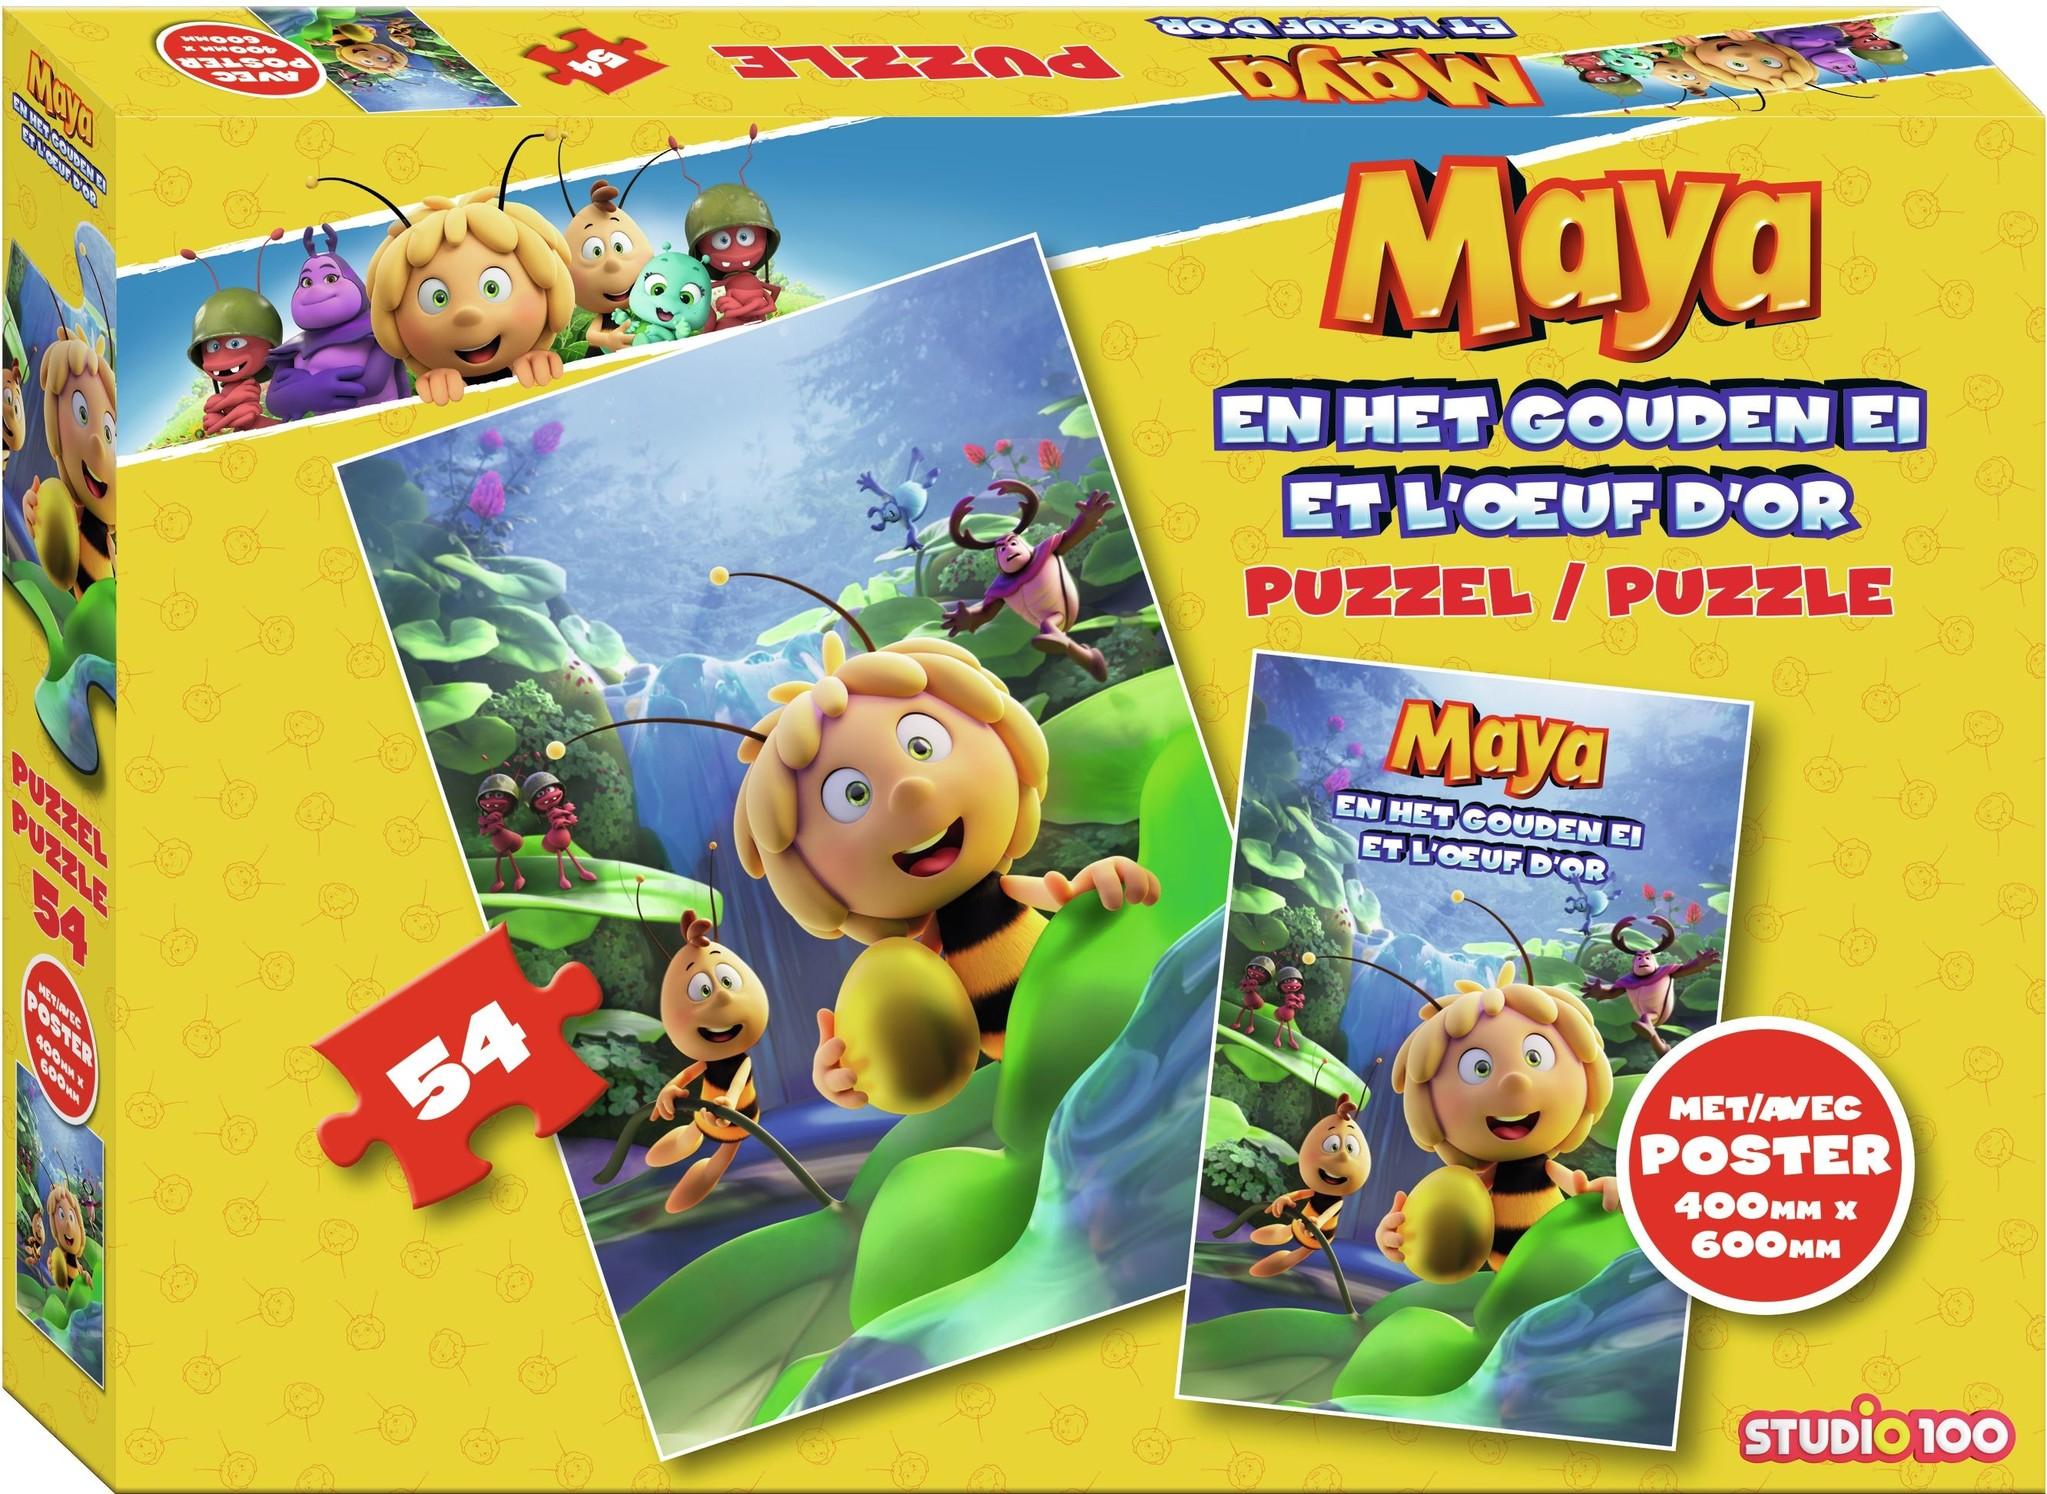 Maya puzzle avec poster